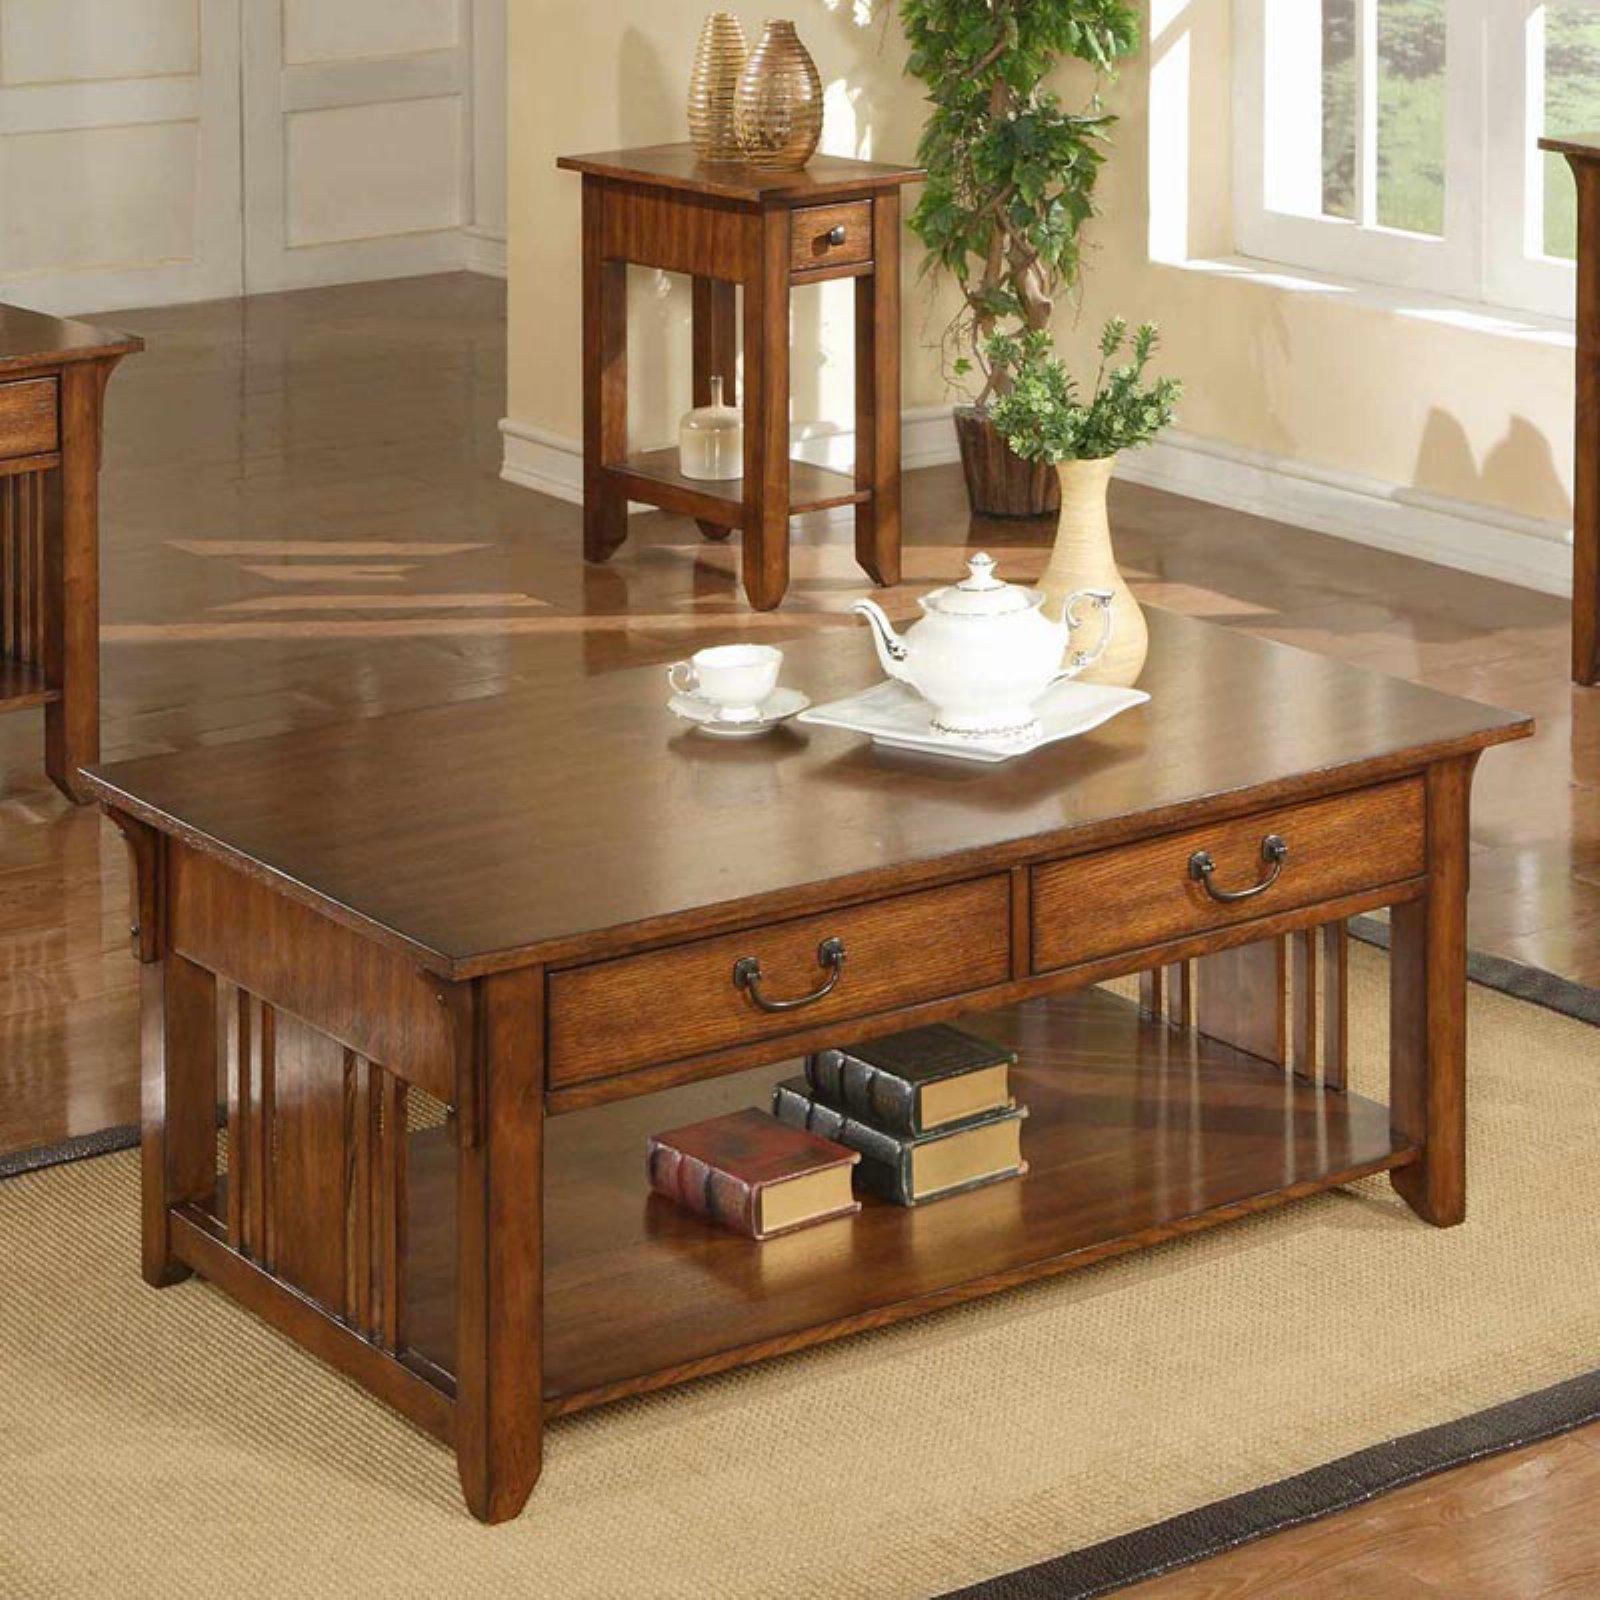 Zahara 2 Drawer Coffee Table Mission Oak Coffee Table Coffee Table End Table Set Round Coffee Table Living Room [ 1600 x 1600 Pixel ]